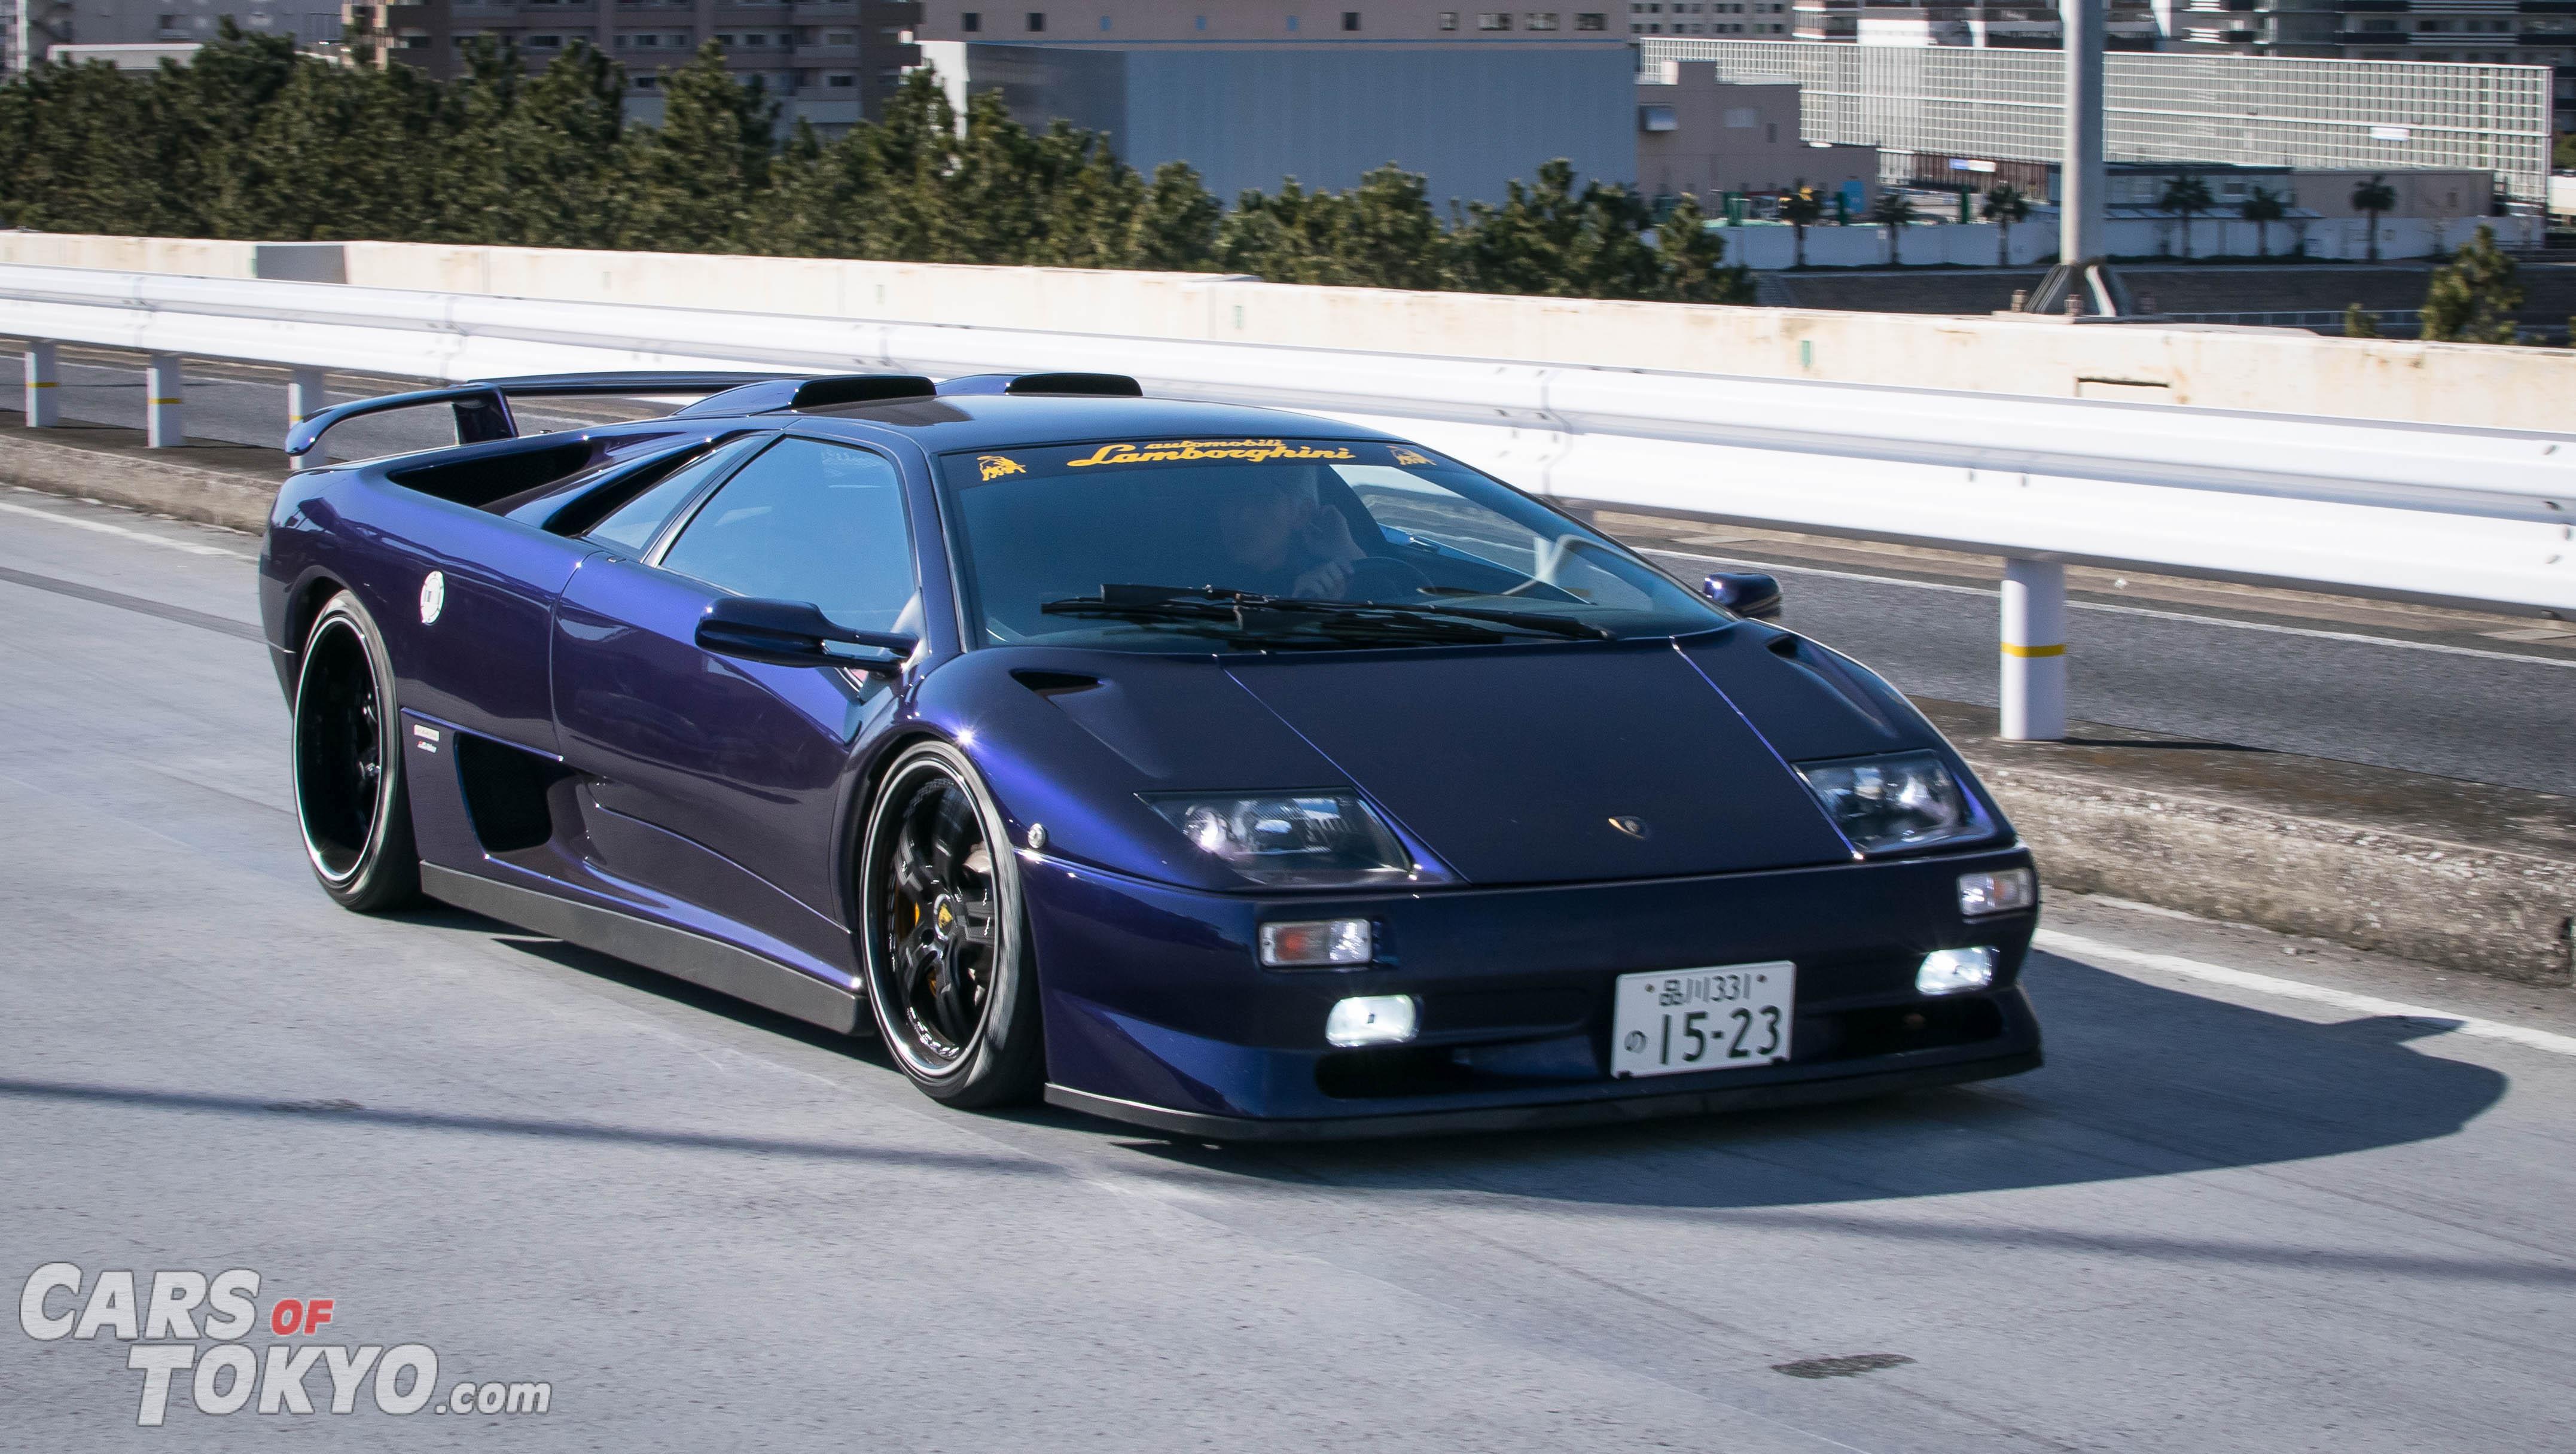 Cars of Tokyo Tatsumi Lamborghini Diablo SV